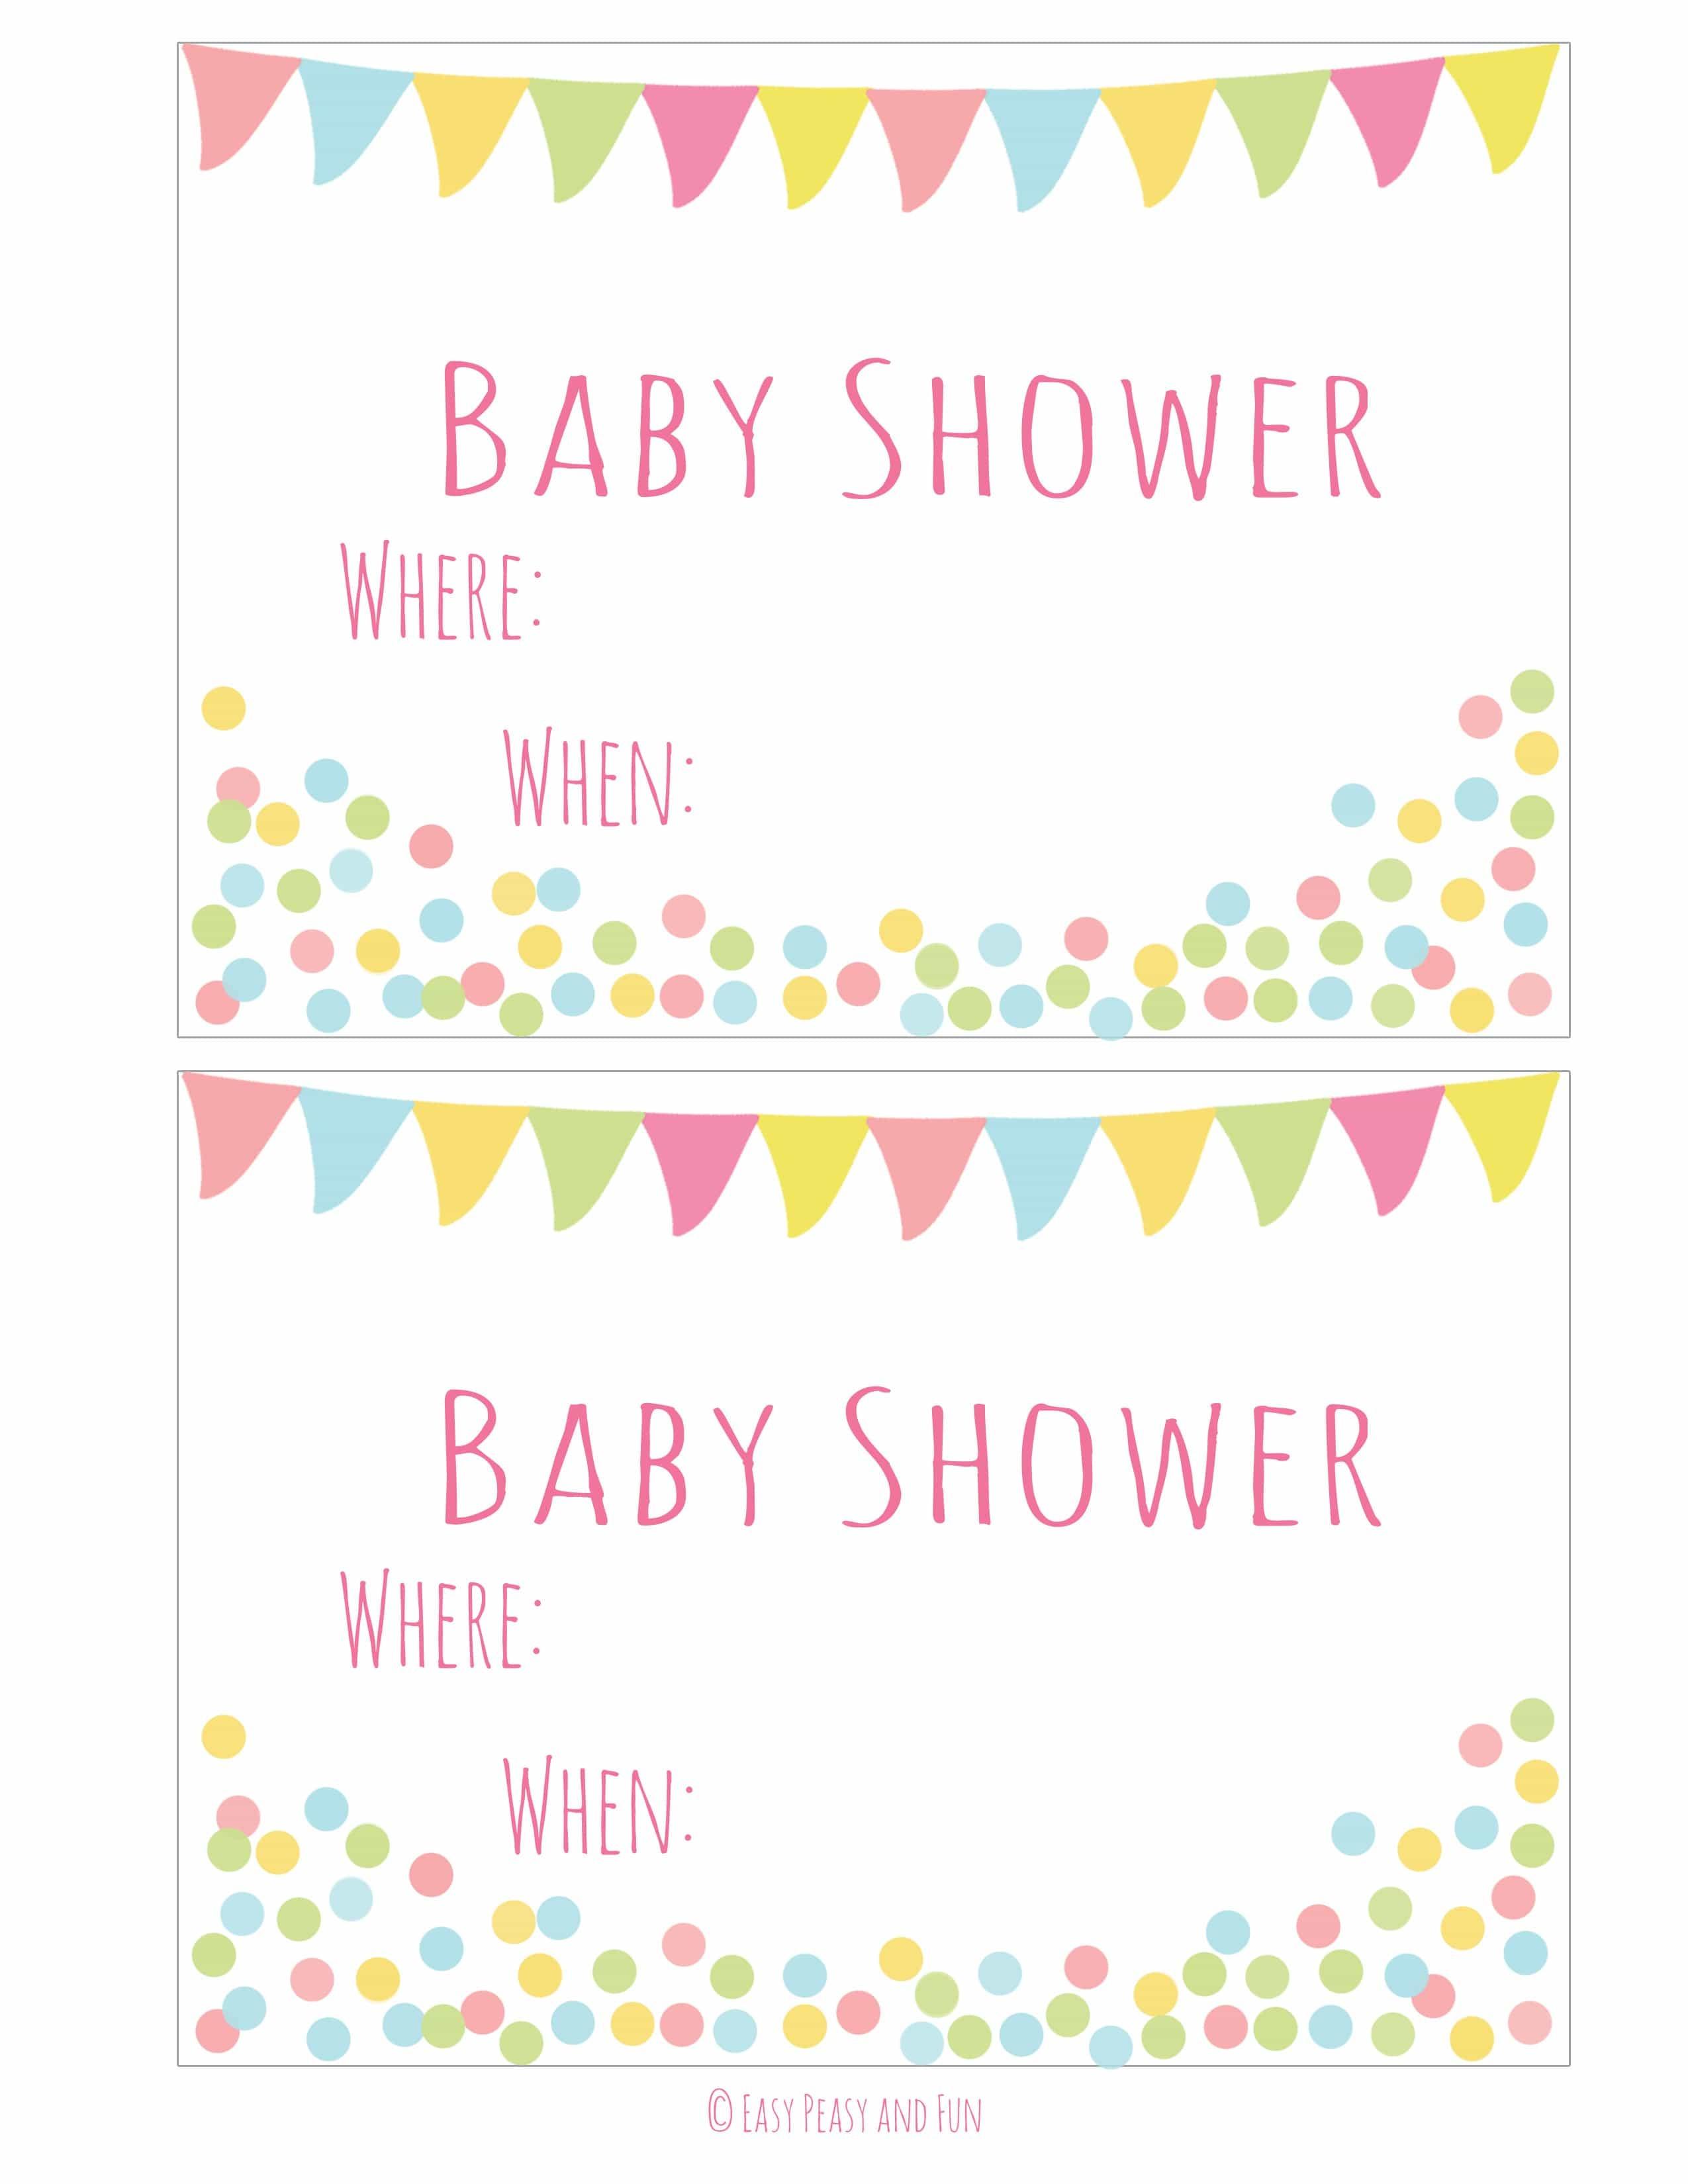 Free Printable Baby Sprinkle Invitations – Baby Shower Ideas - Free Printable Baby Sprinkle Invitations